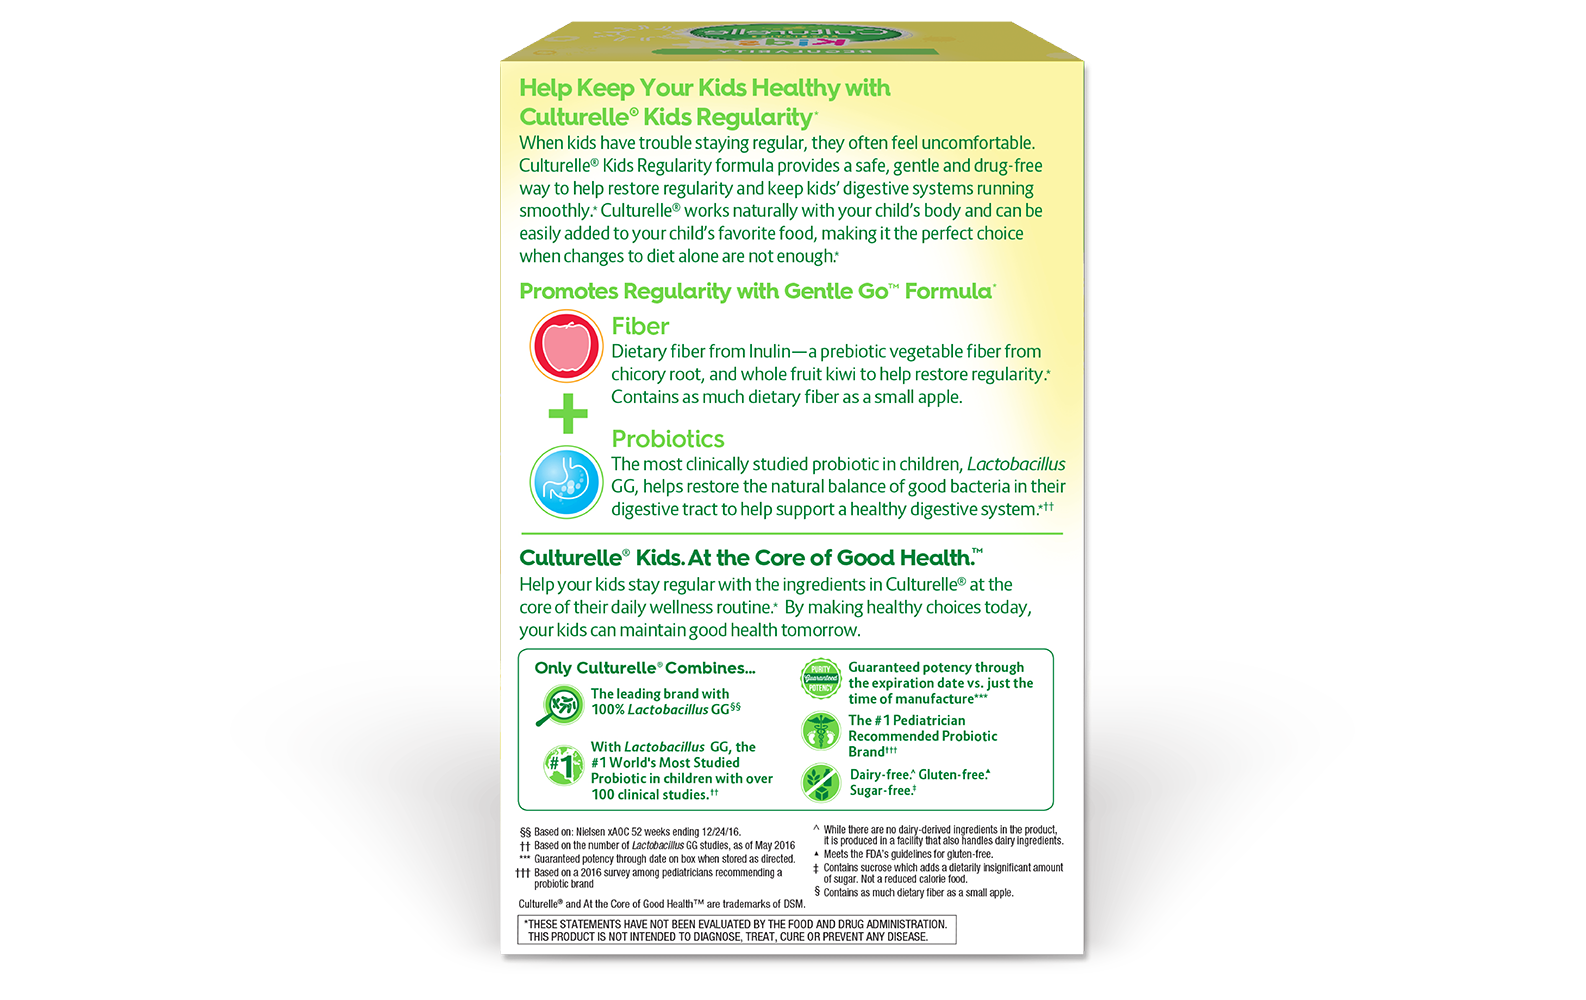 Kids Digestive Health And Regularity Culturelle 174